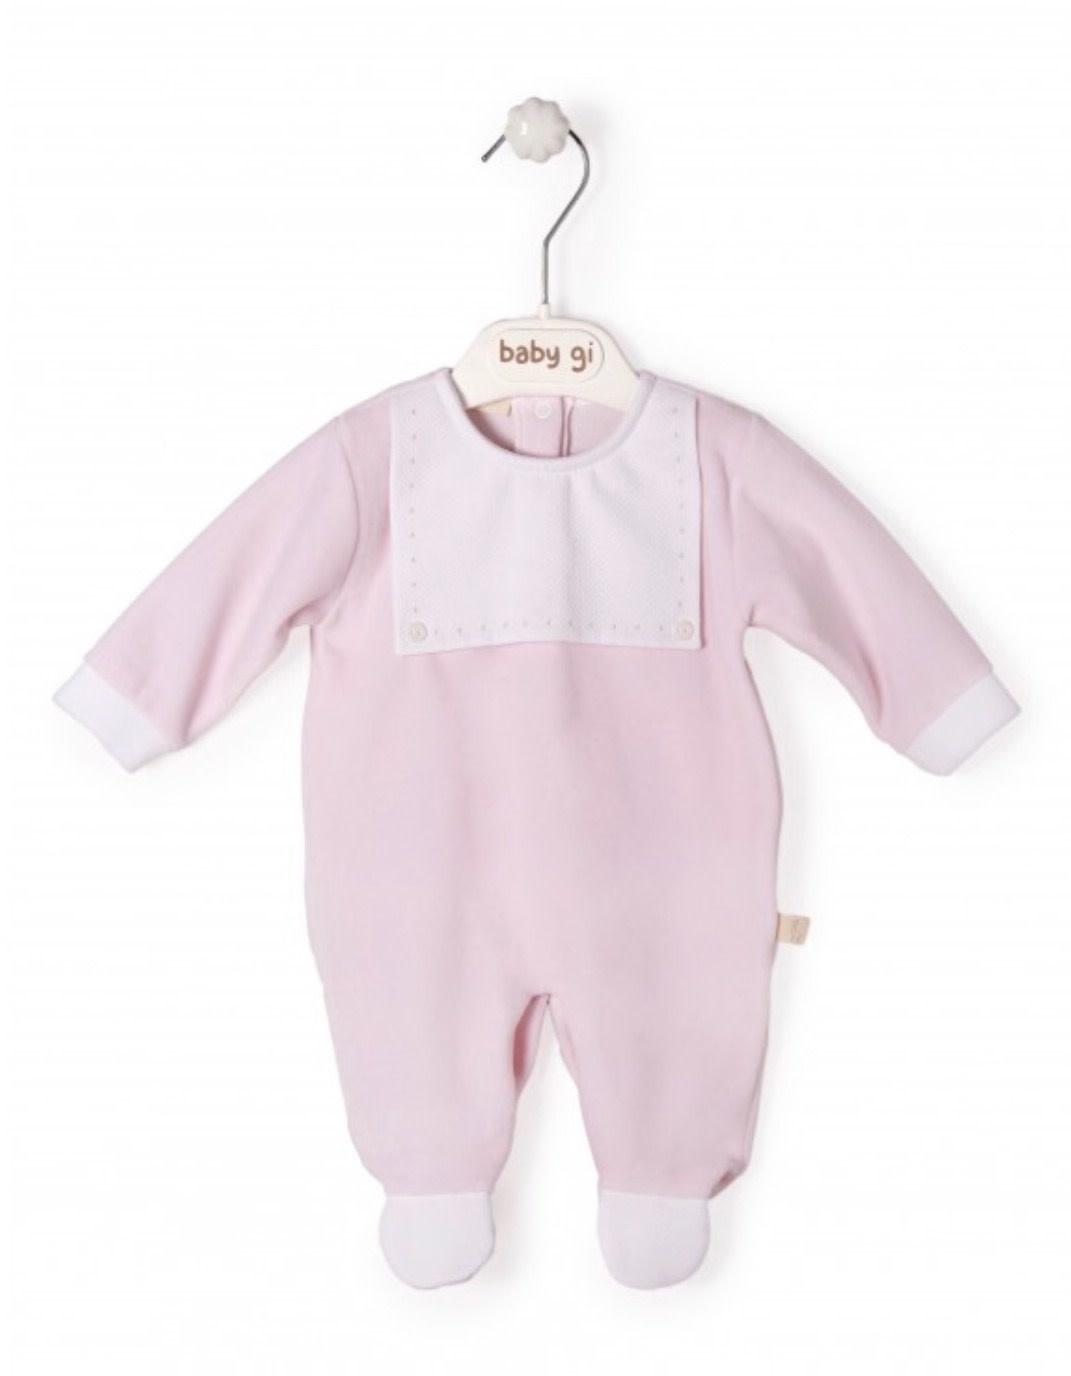 Baby Gi Baby Gi Pink Babygrow with Bib